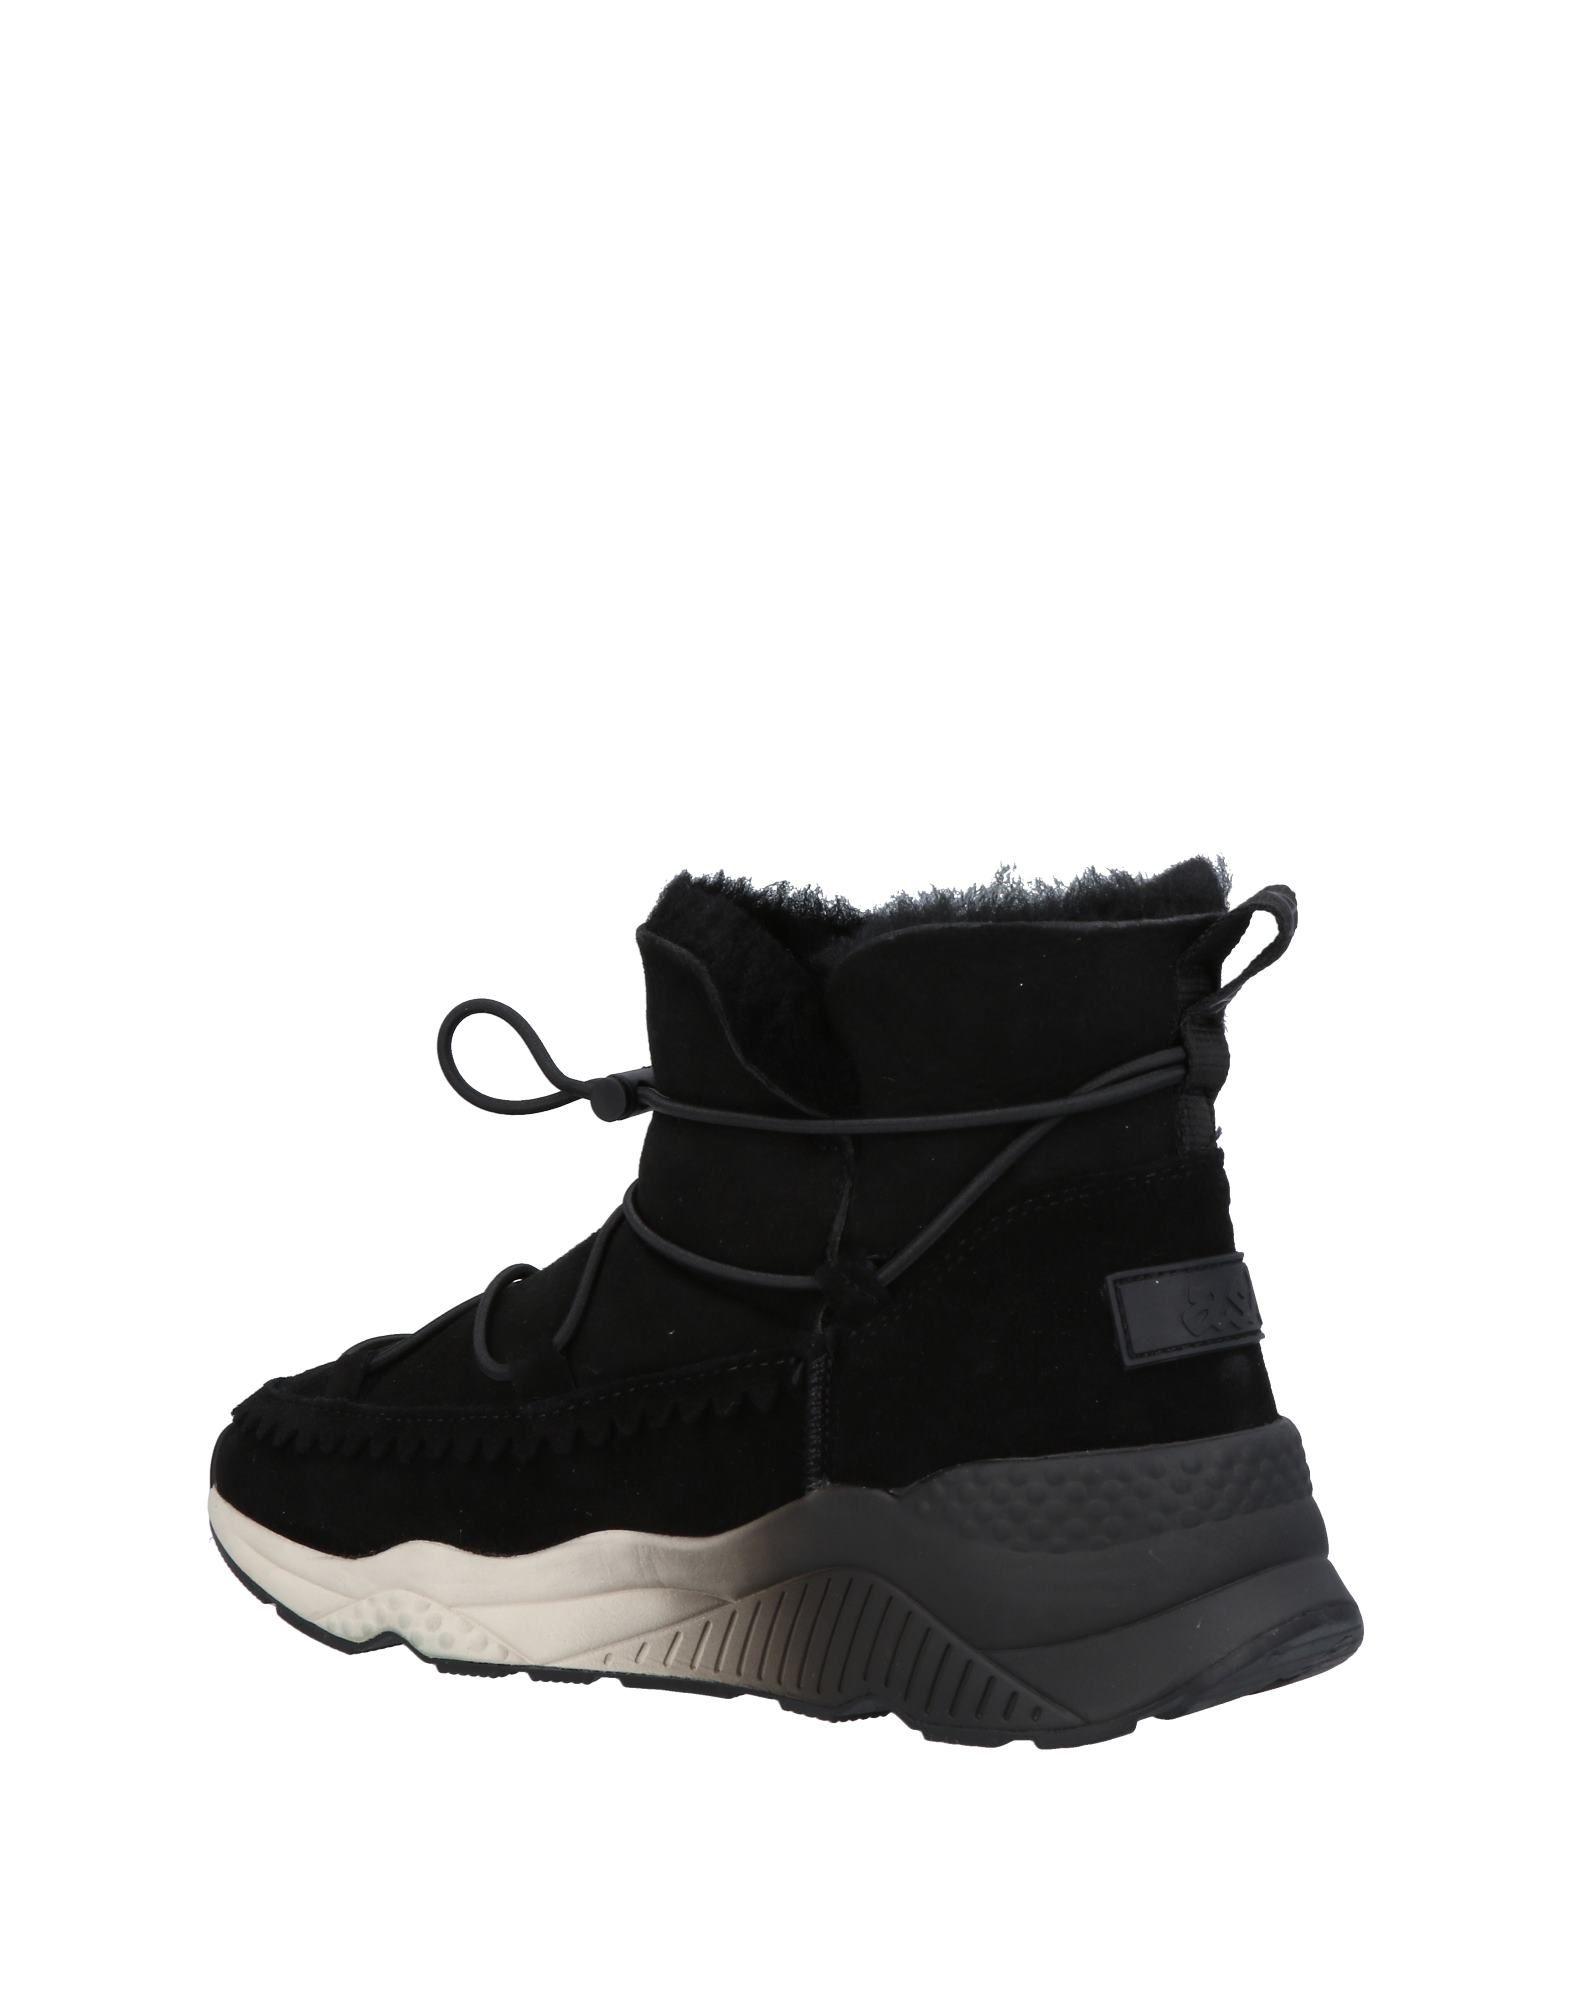 Ash Sneakers Damen  11468344HIGut aussehende strapazierfähige strapazierfähige strapazierfähige Schuhe 85f170